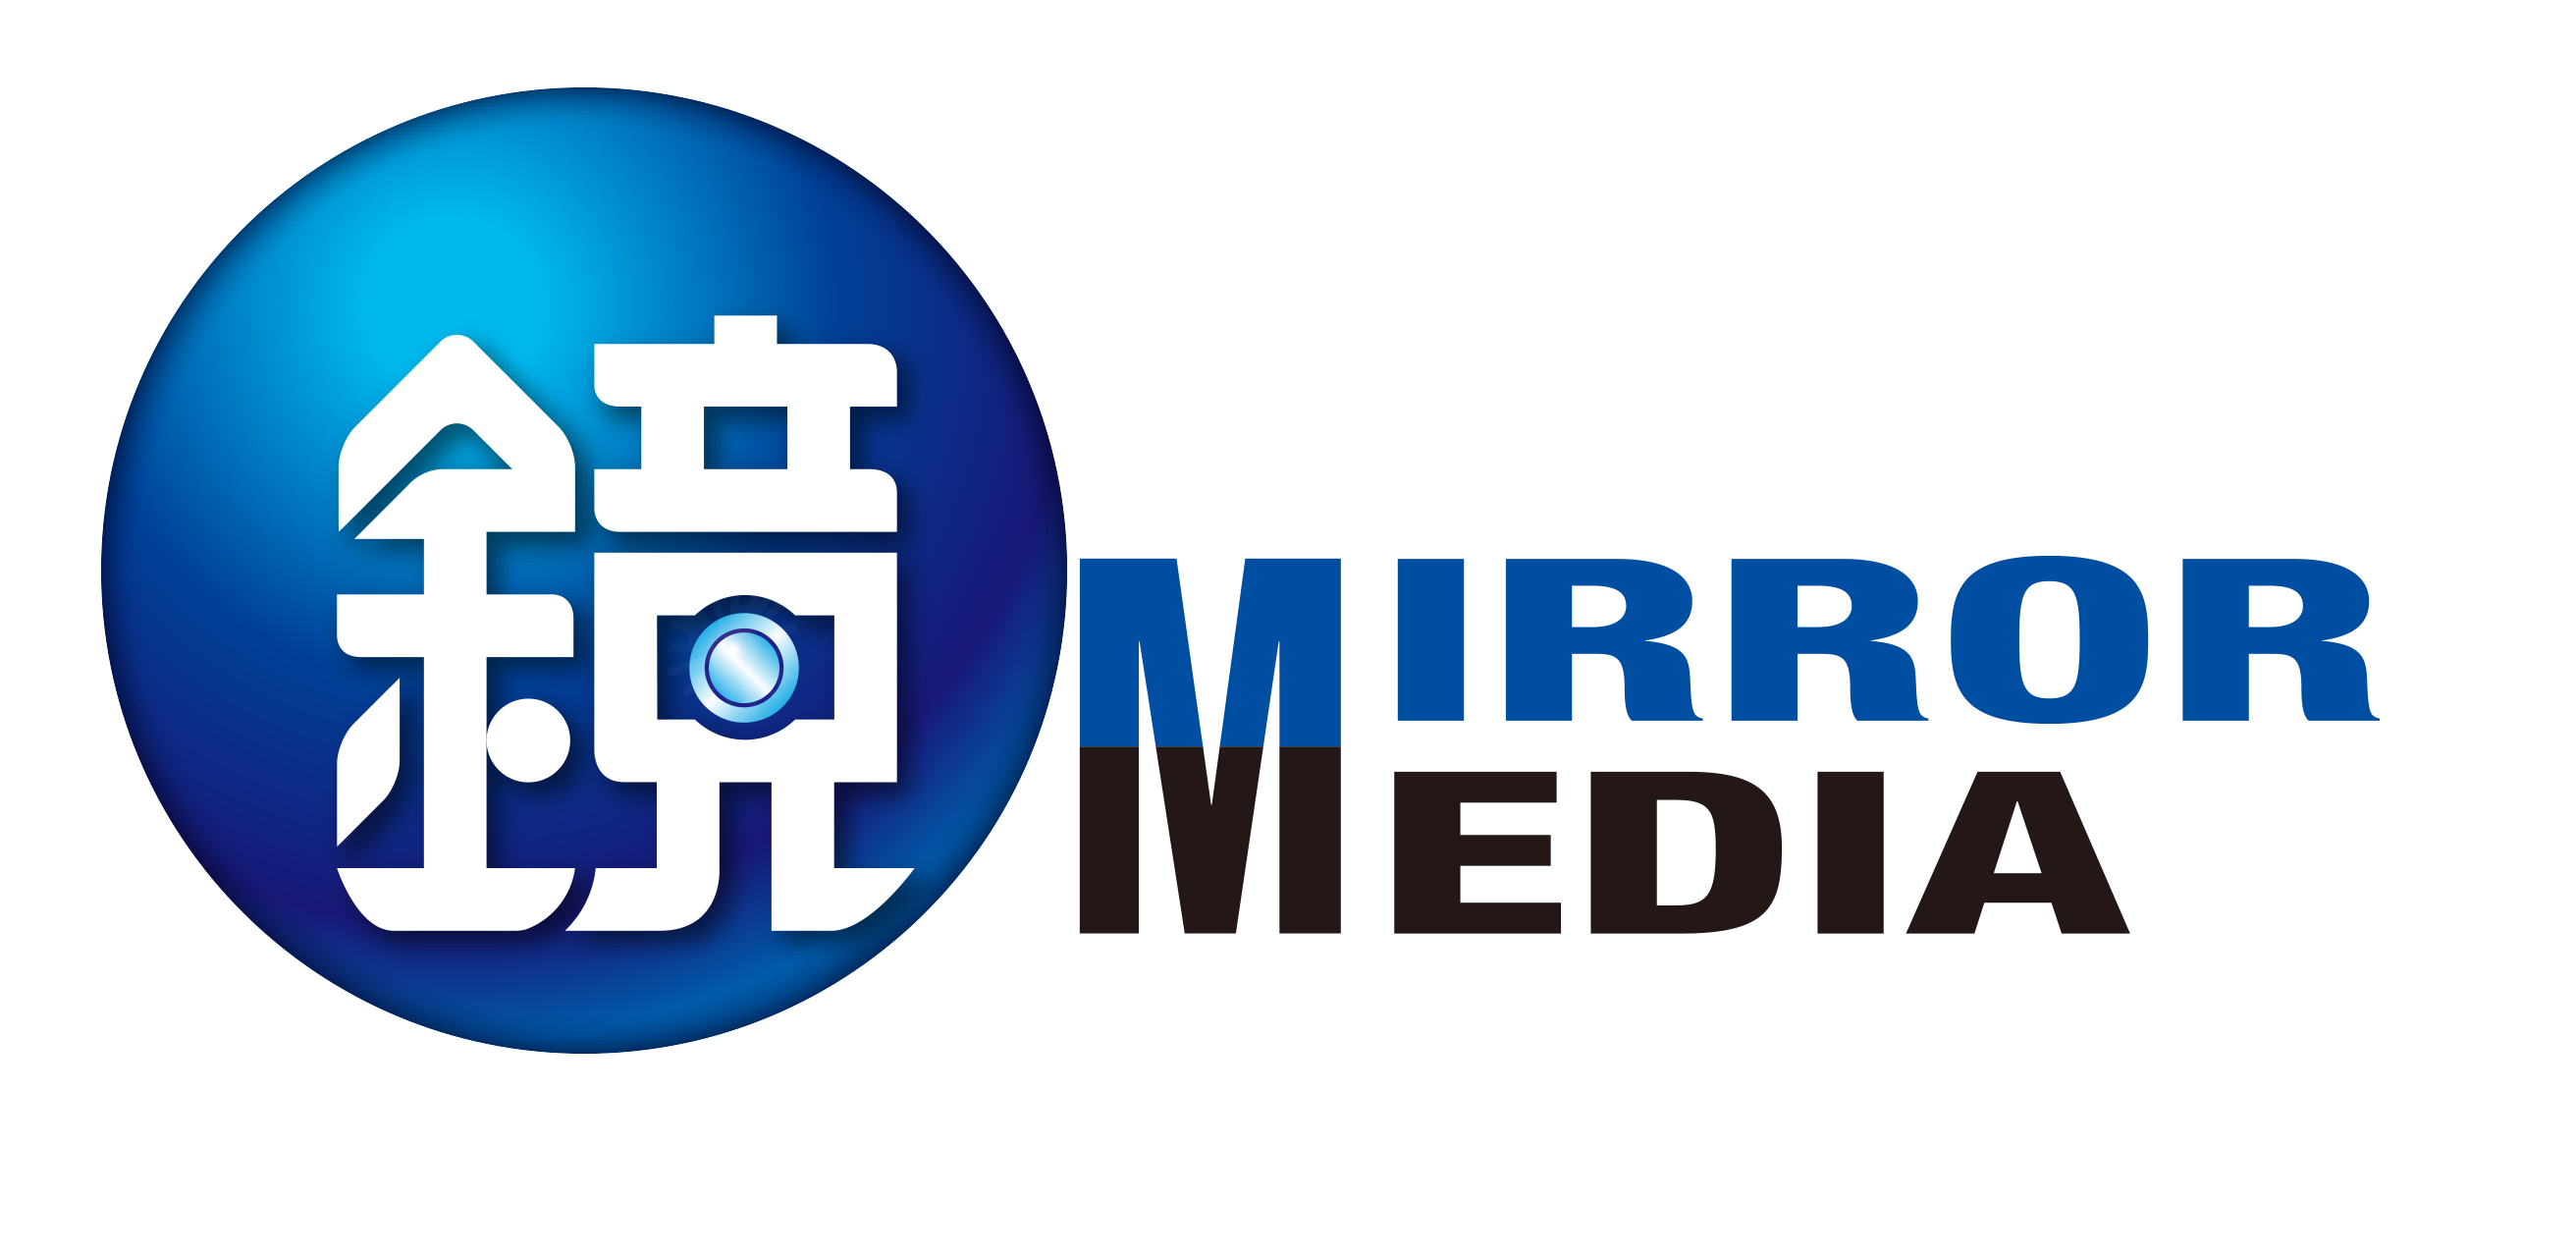 鏡週刊logo.PNG